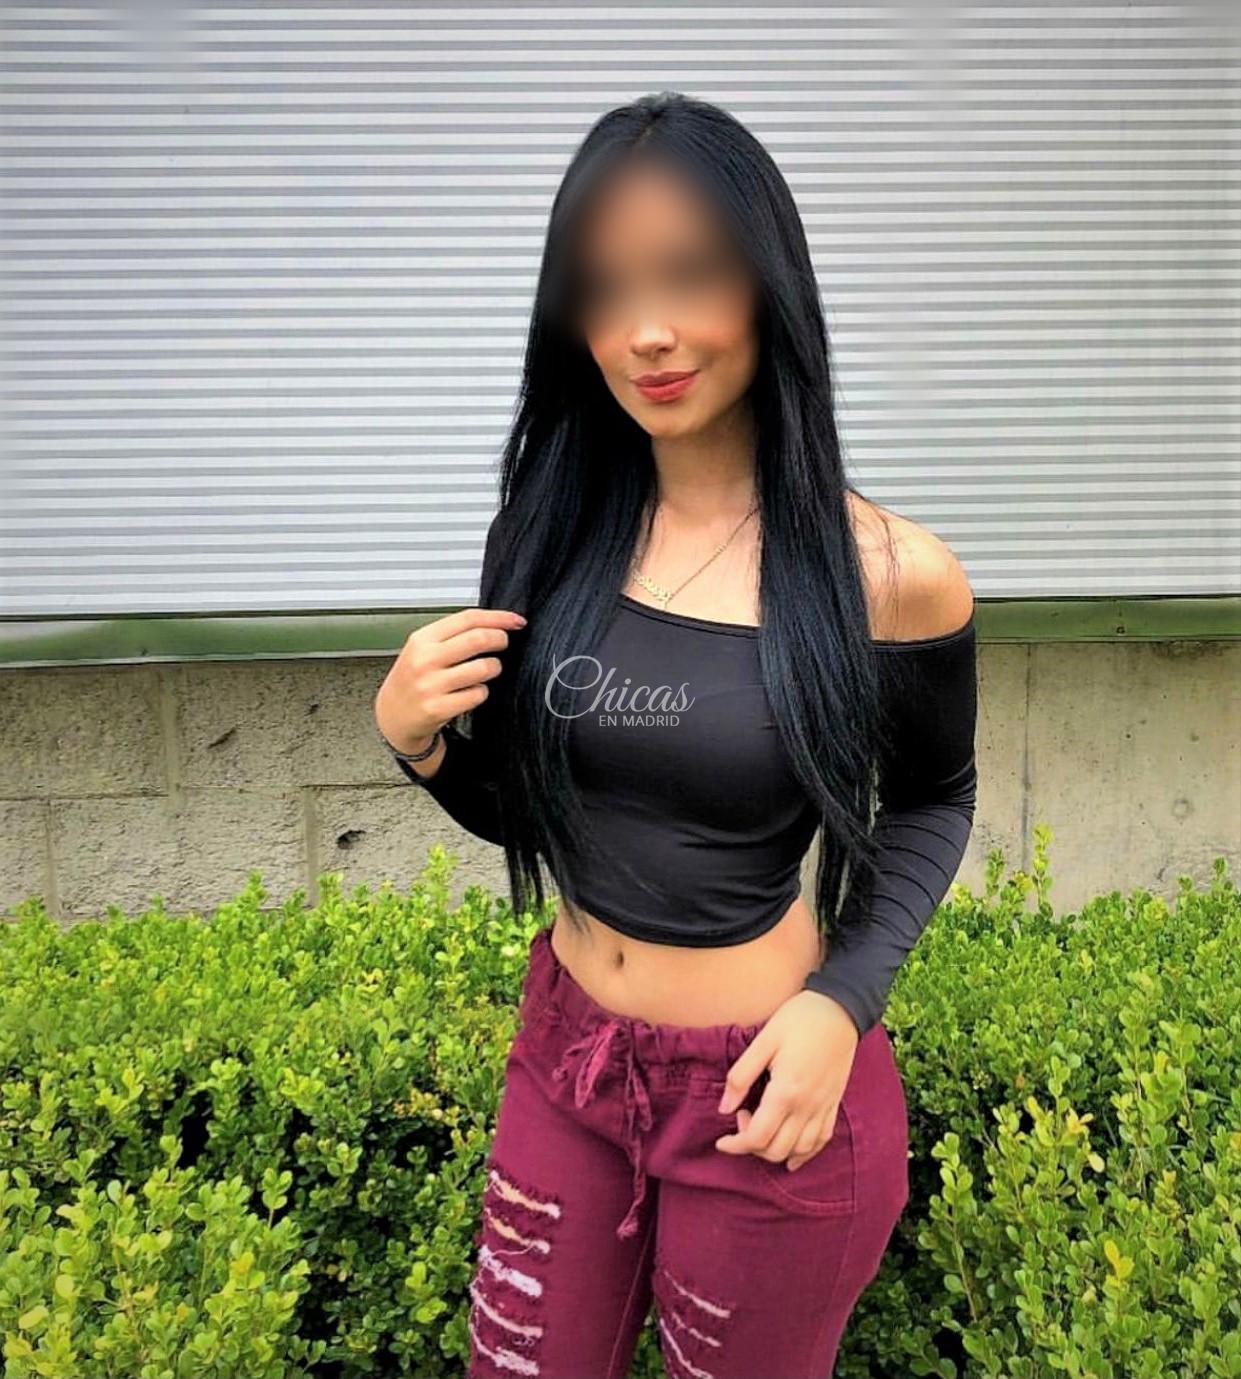 puta, puta venezolana, agencia de escorts, chicas en madrid